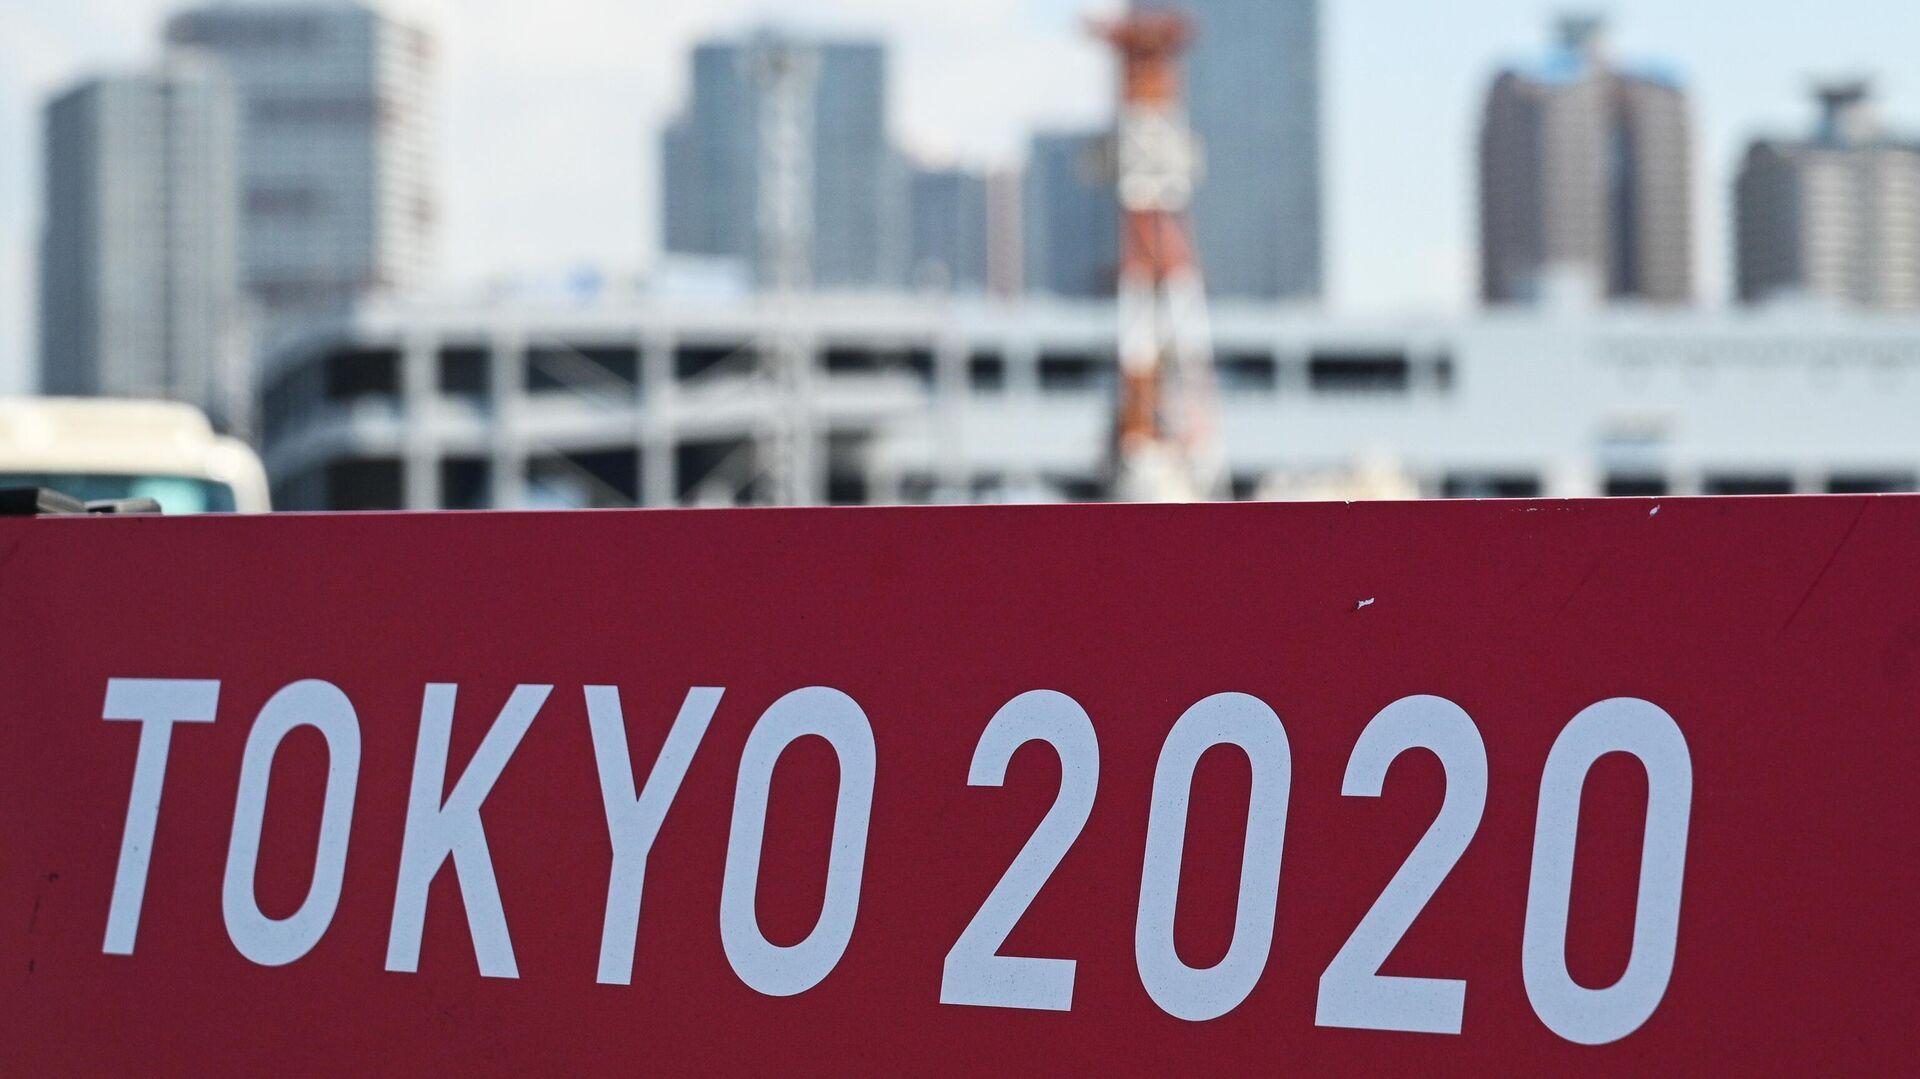 Города мира. Токио - РИА Новости, 1920, 23.07.2021